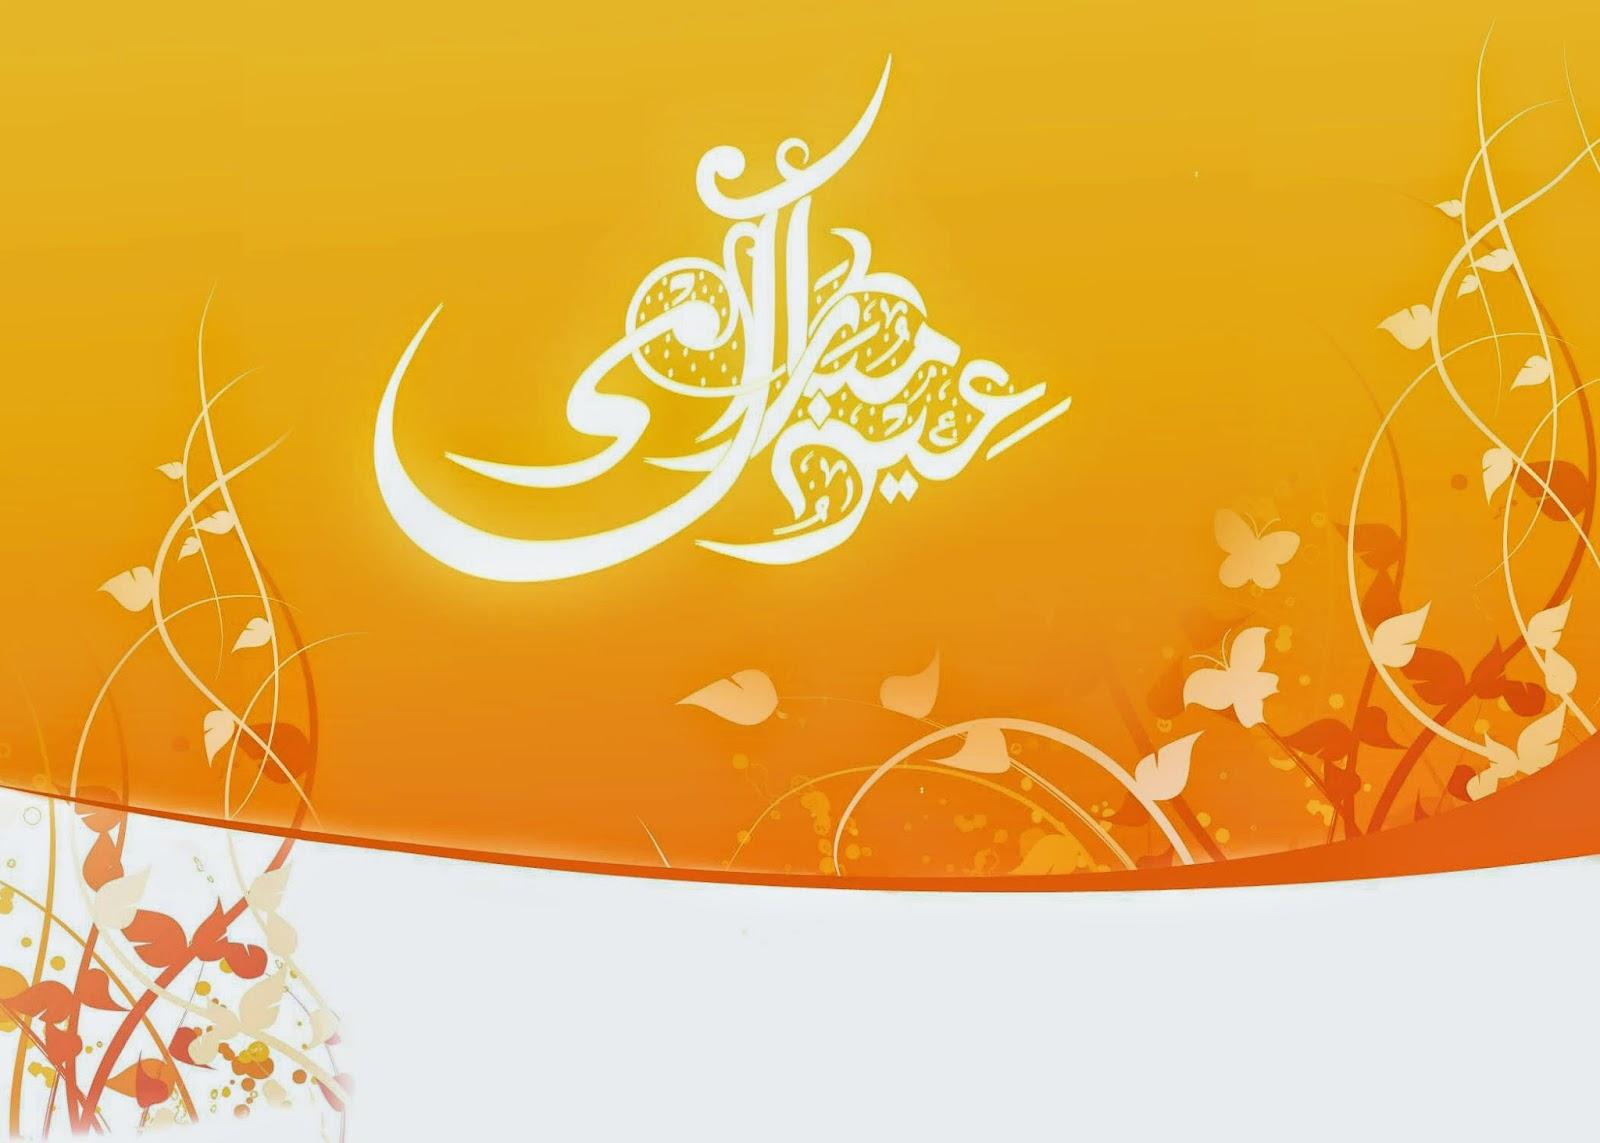 http://eidulfitrmubarak.blogspot.com/2014/07/eid-mubarak-greeting-cardsquotes-and.html